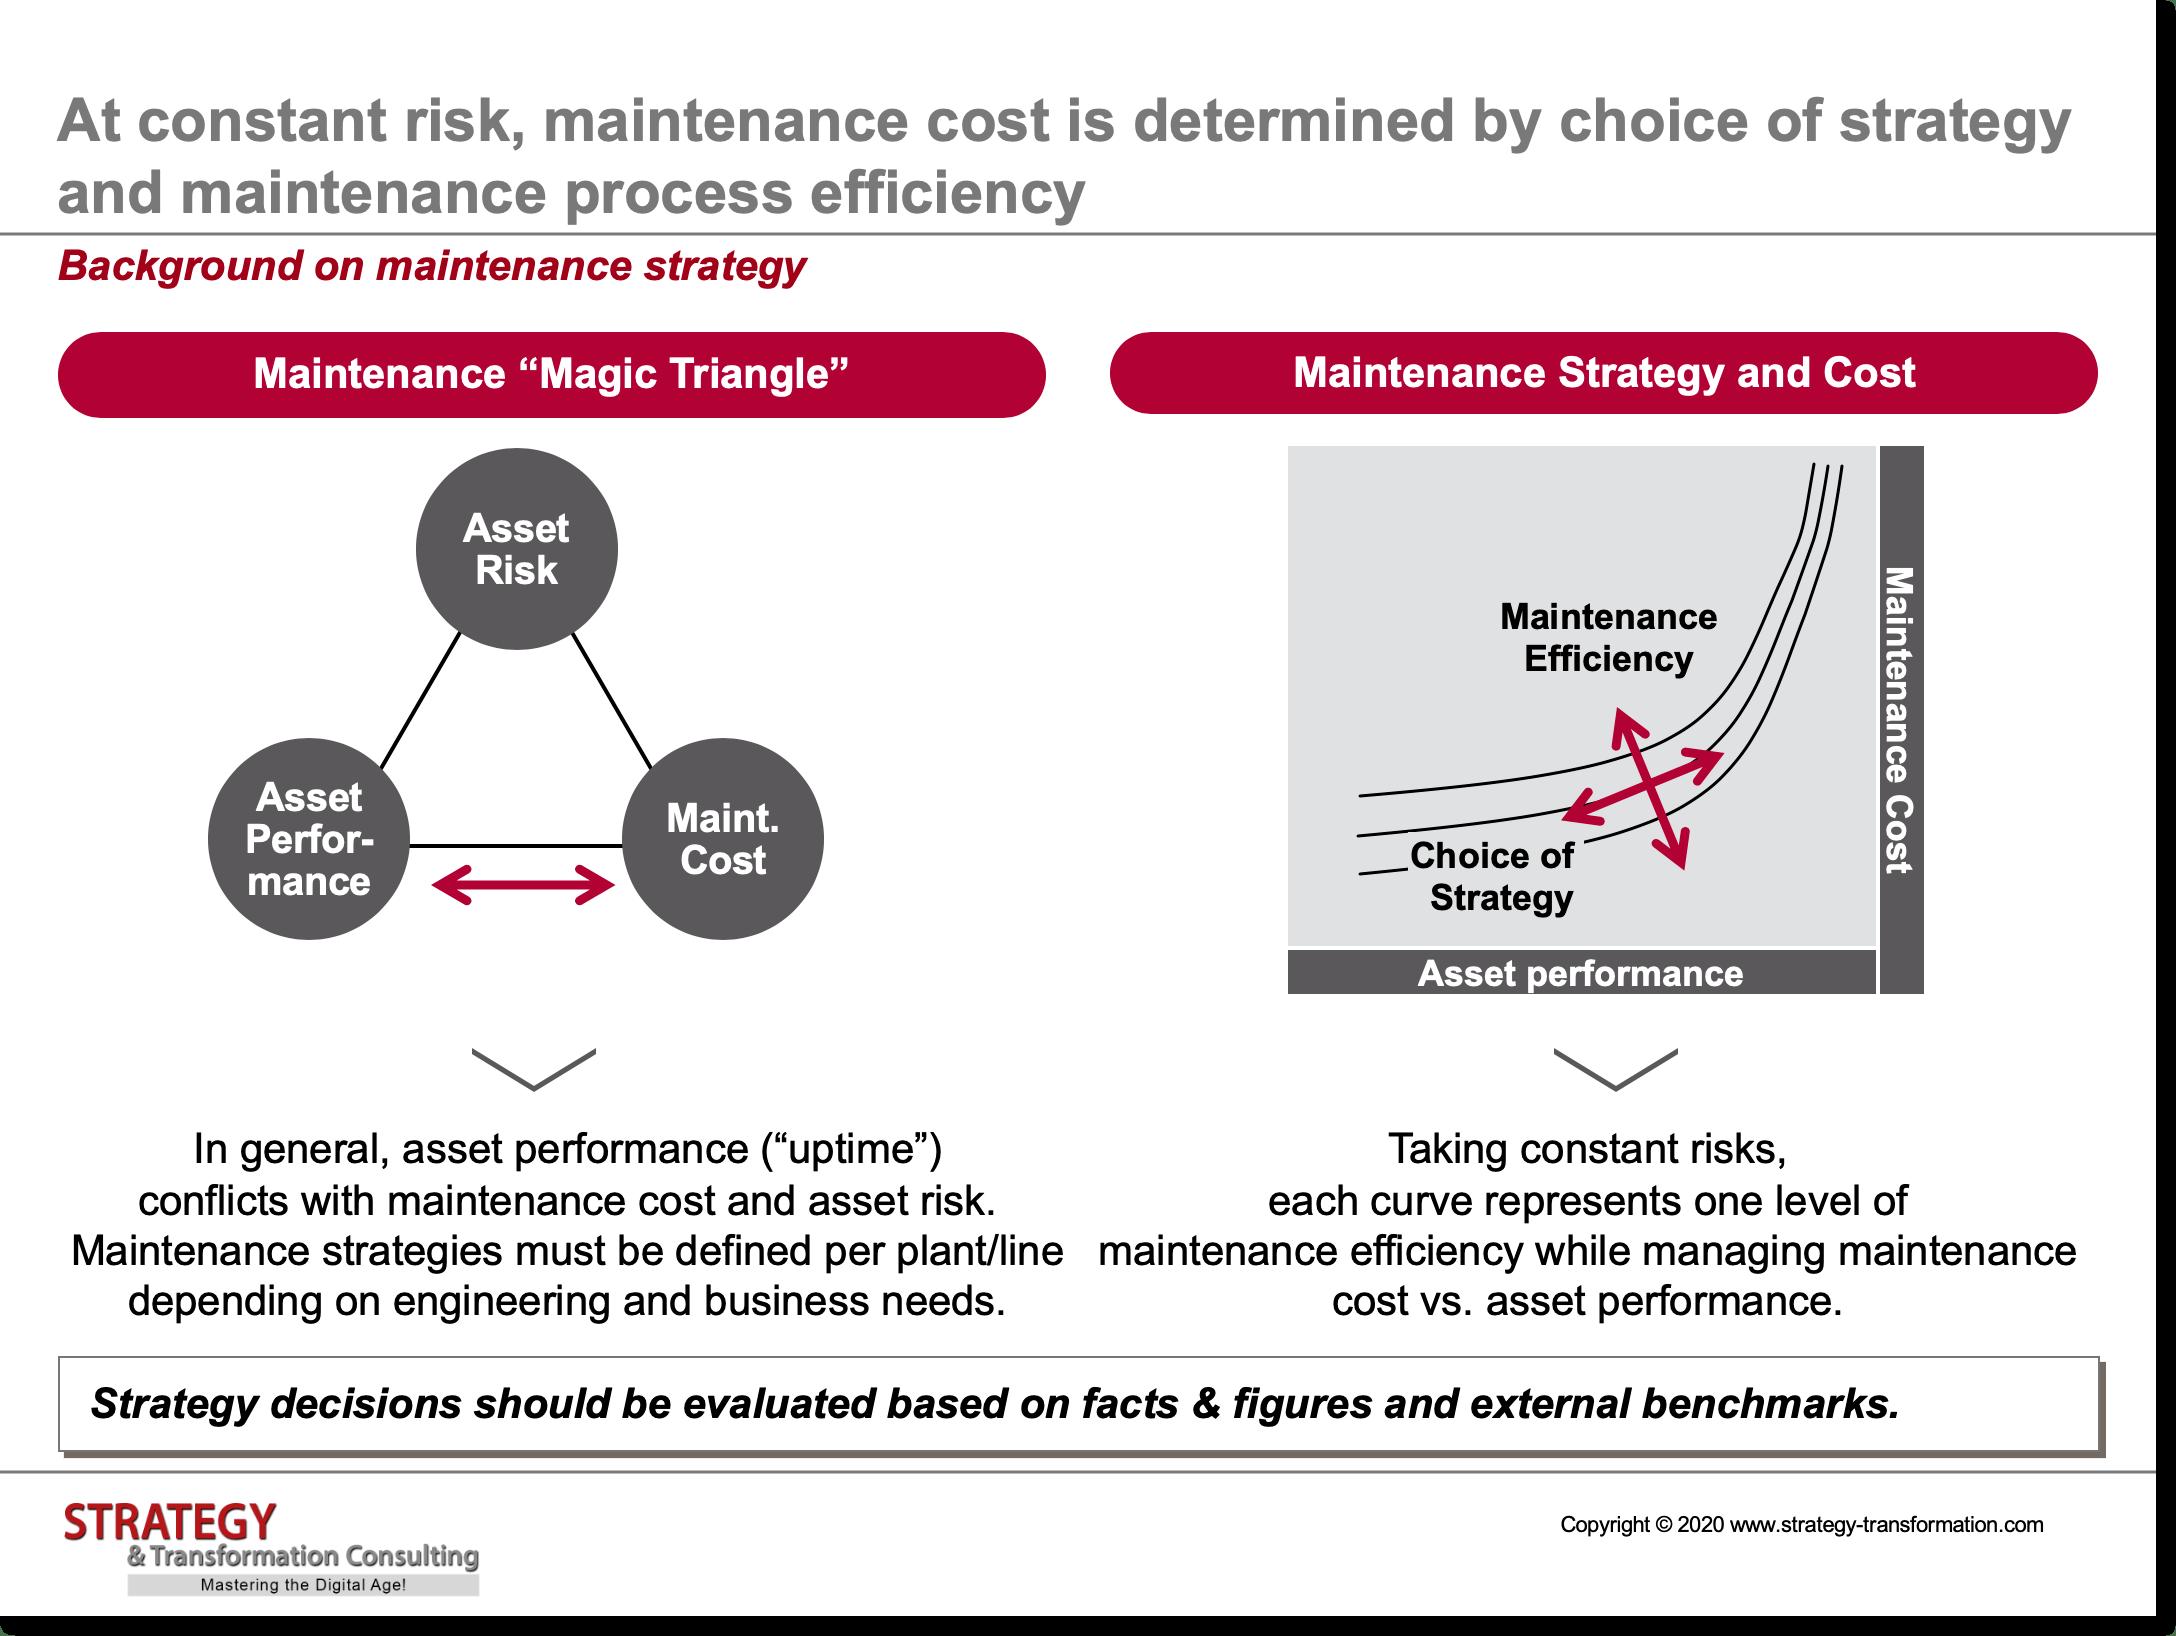 Background on maintenance strategy